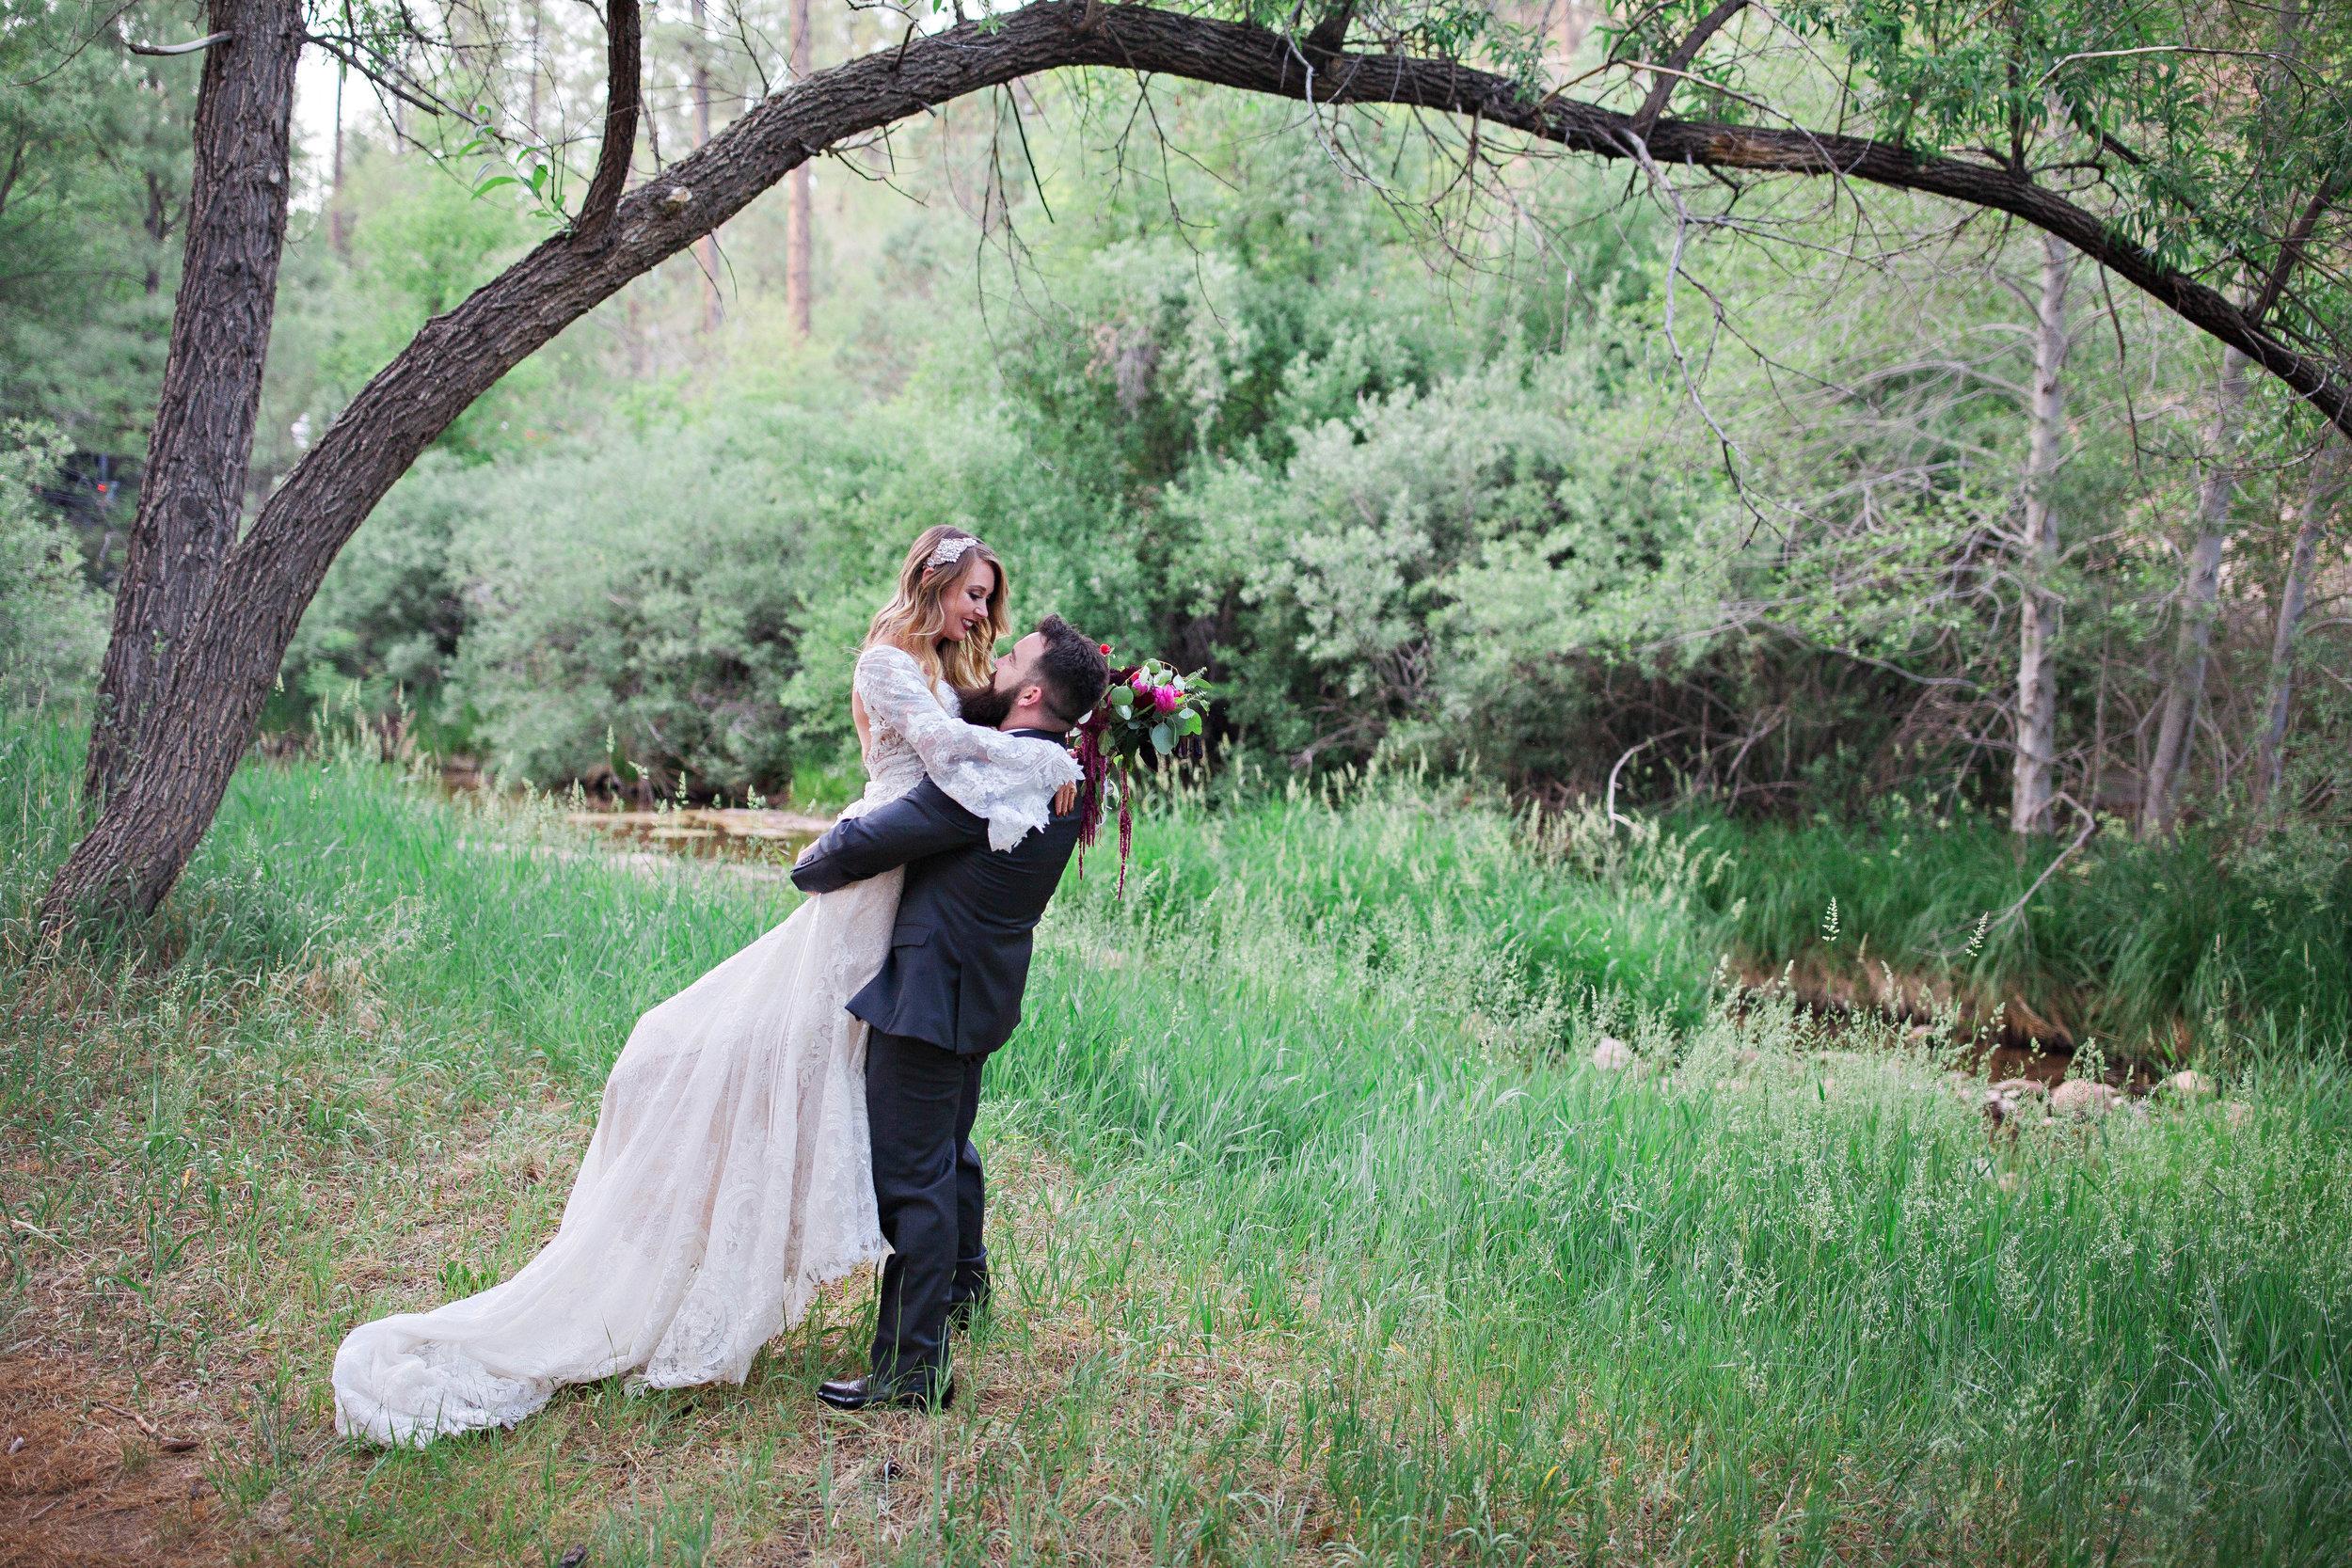 weddings-payson-14.jpg